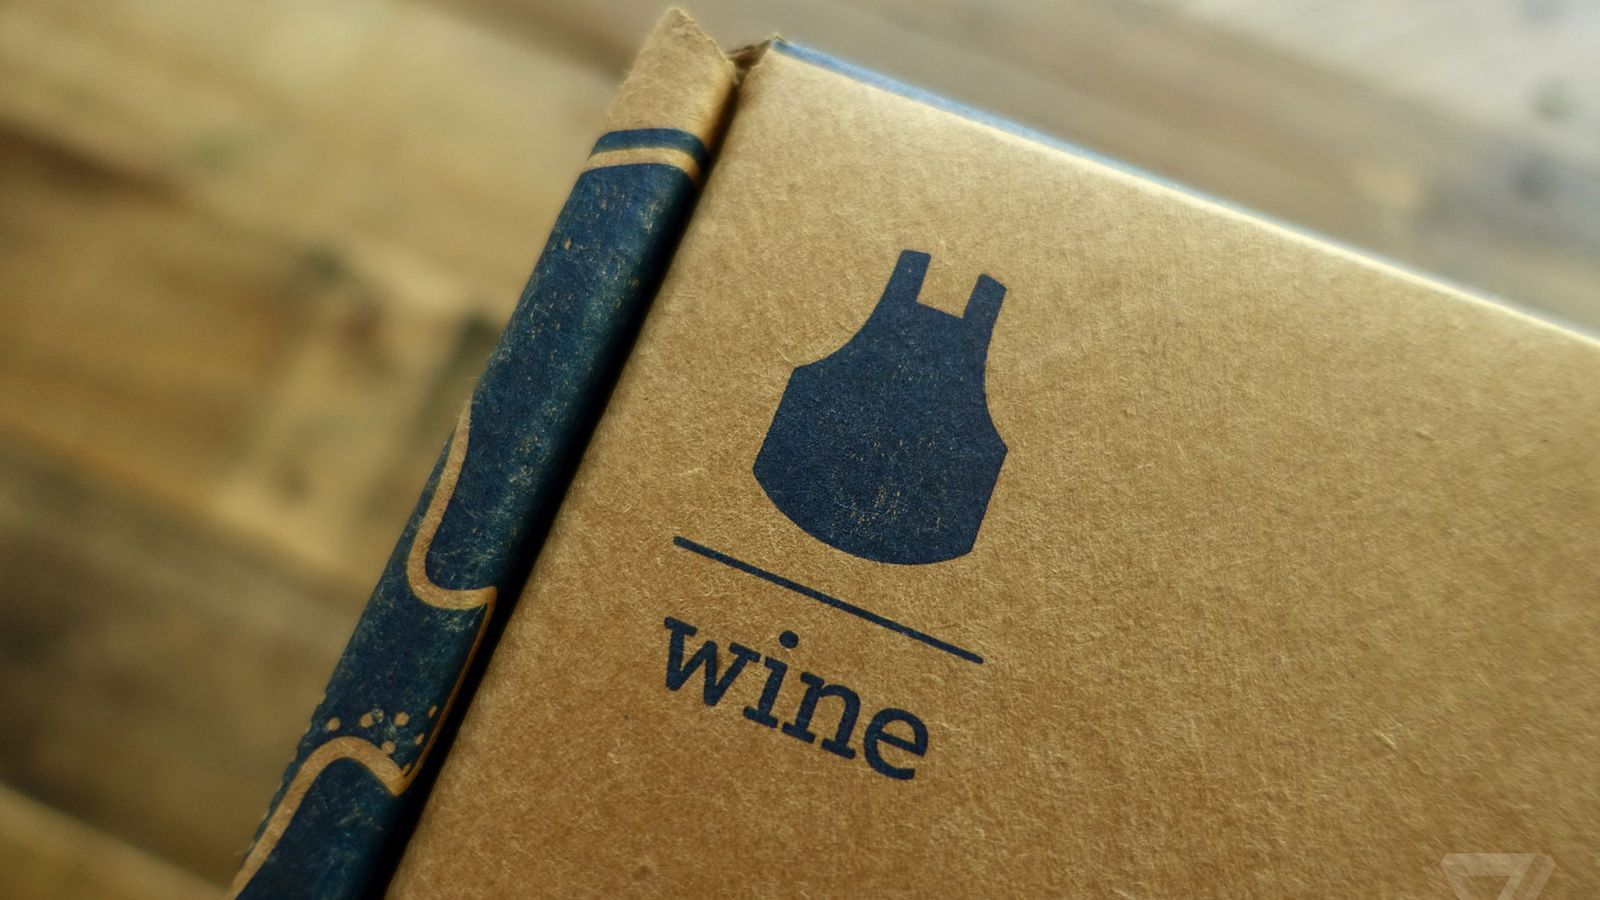 Blue apron wine review - Blue Apron Wine Review 15